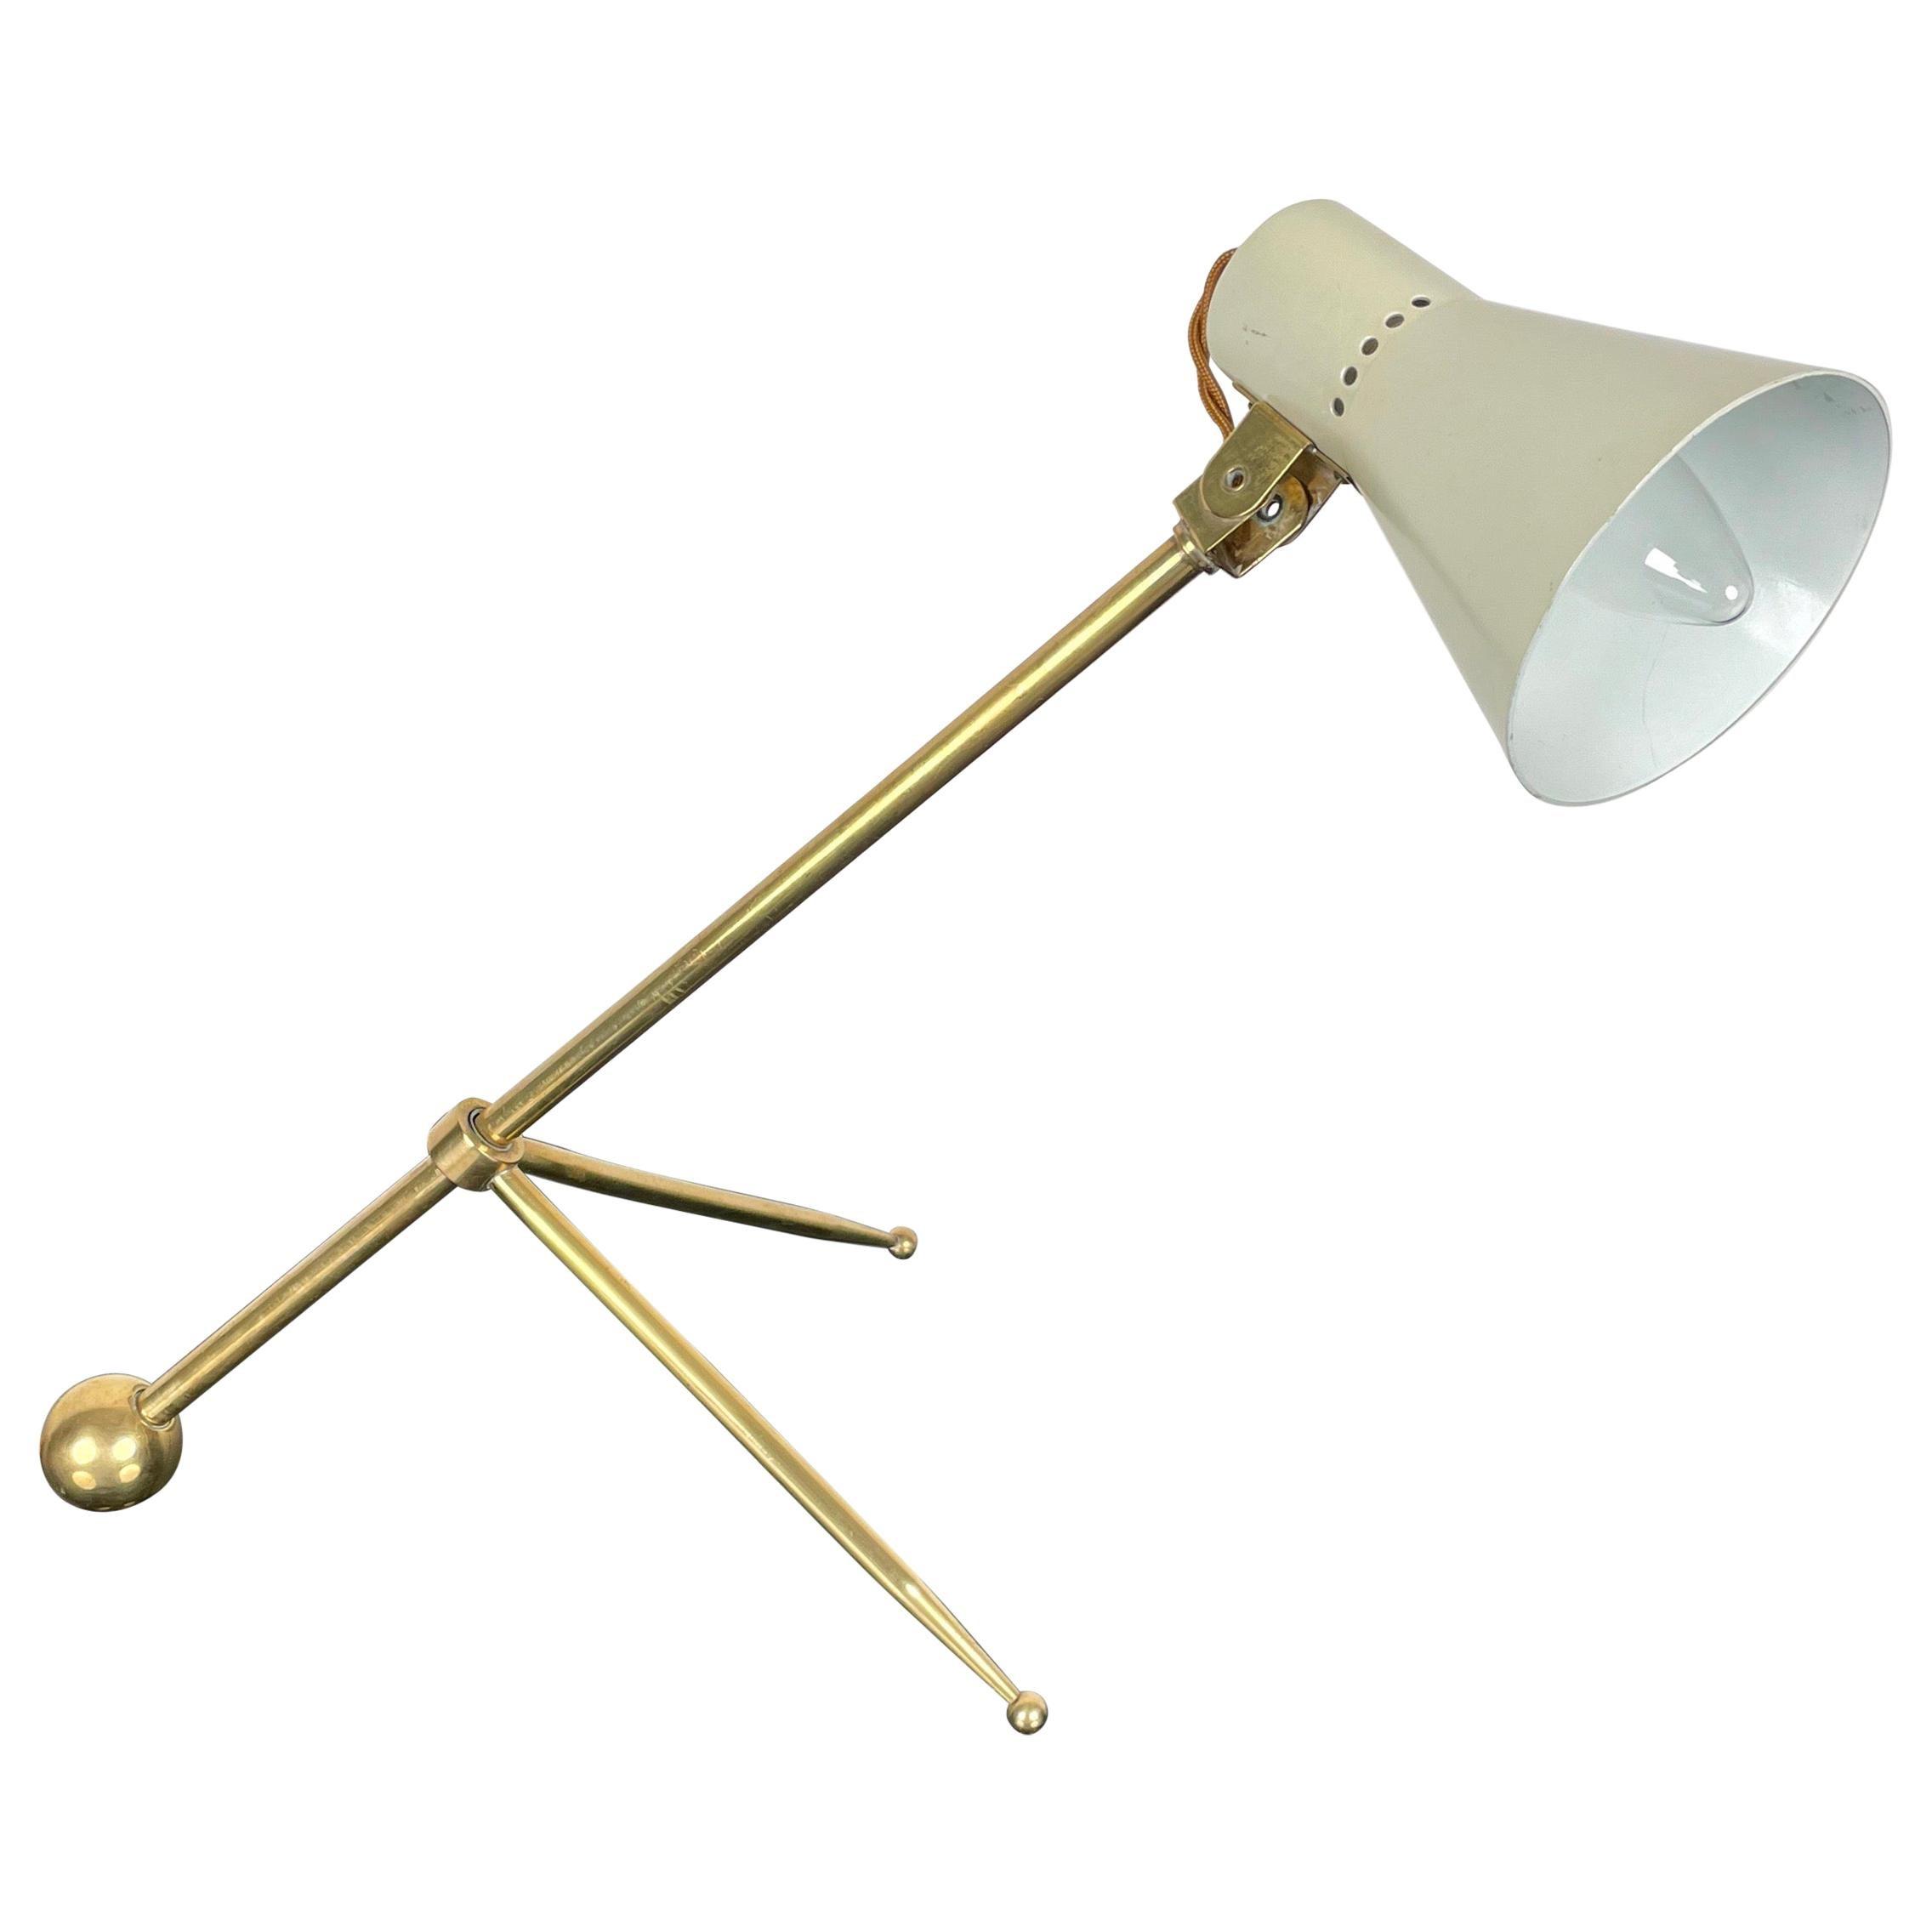 Brass Tripod Desk Table Lamp Attributed to Stilnovo, Italy, 1950s